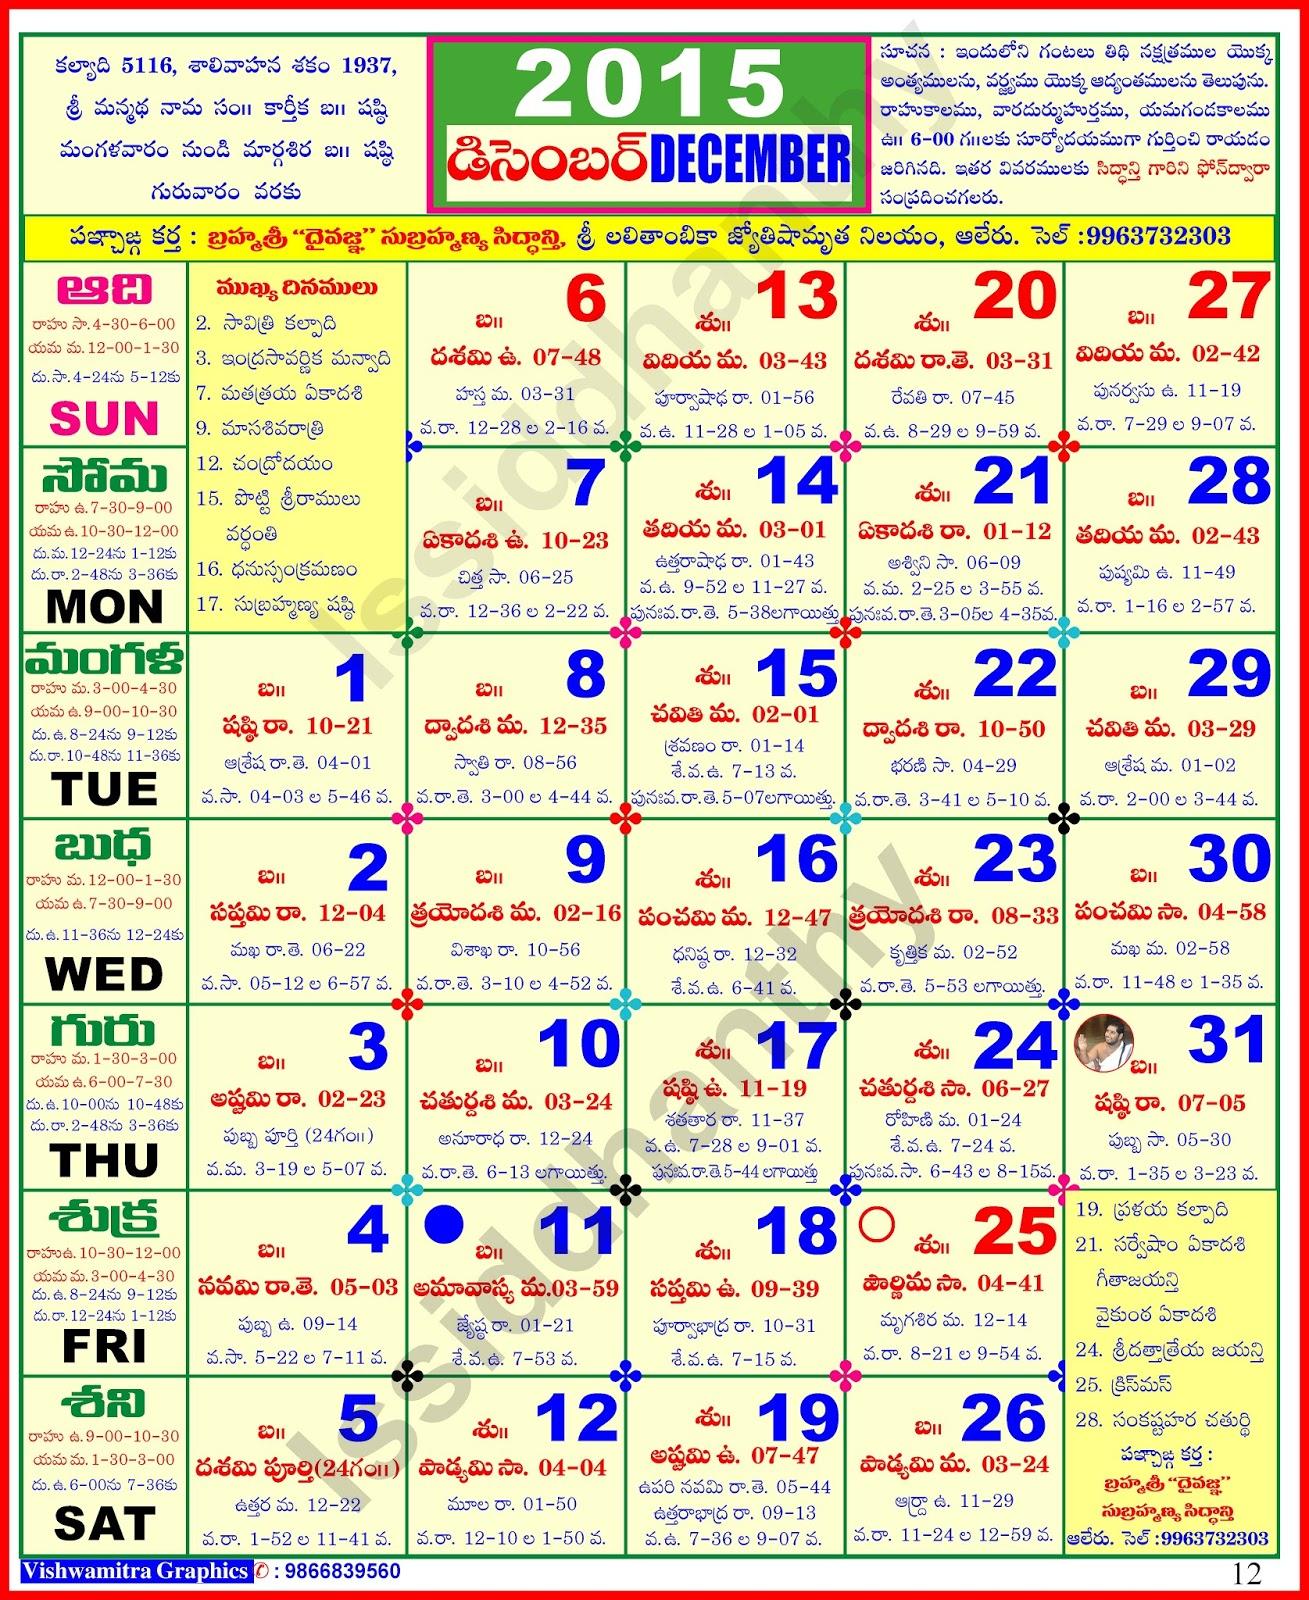 2015 Calendar _by L S Siddhanthy_2015 క్యాలెండర్ ...